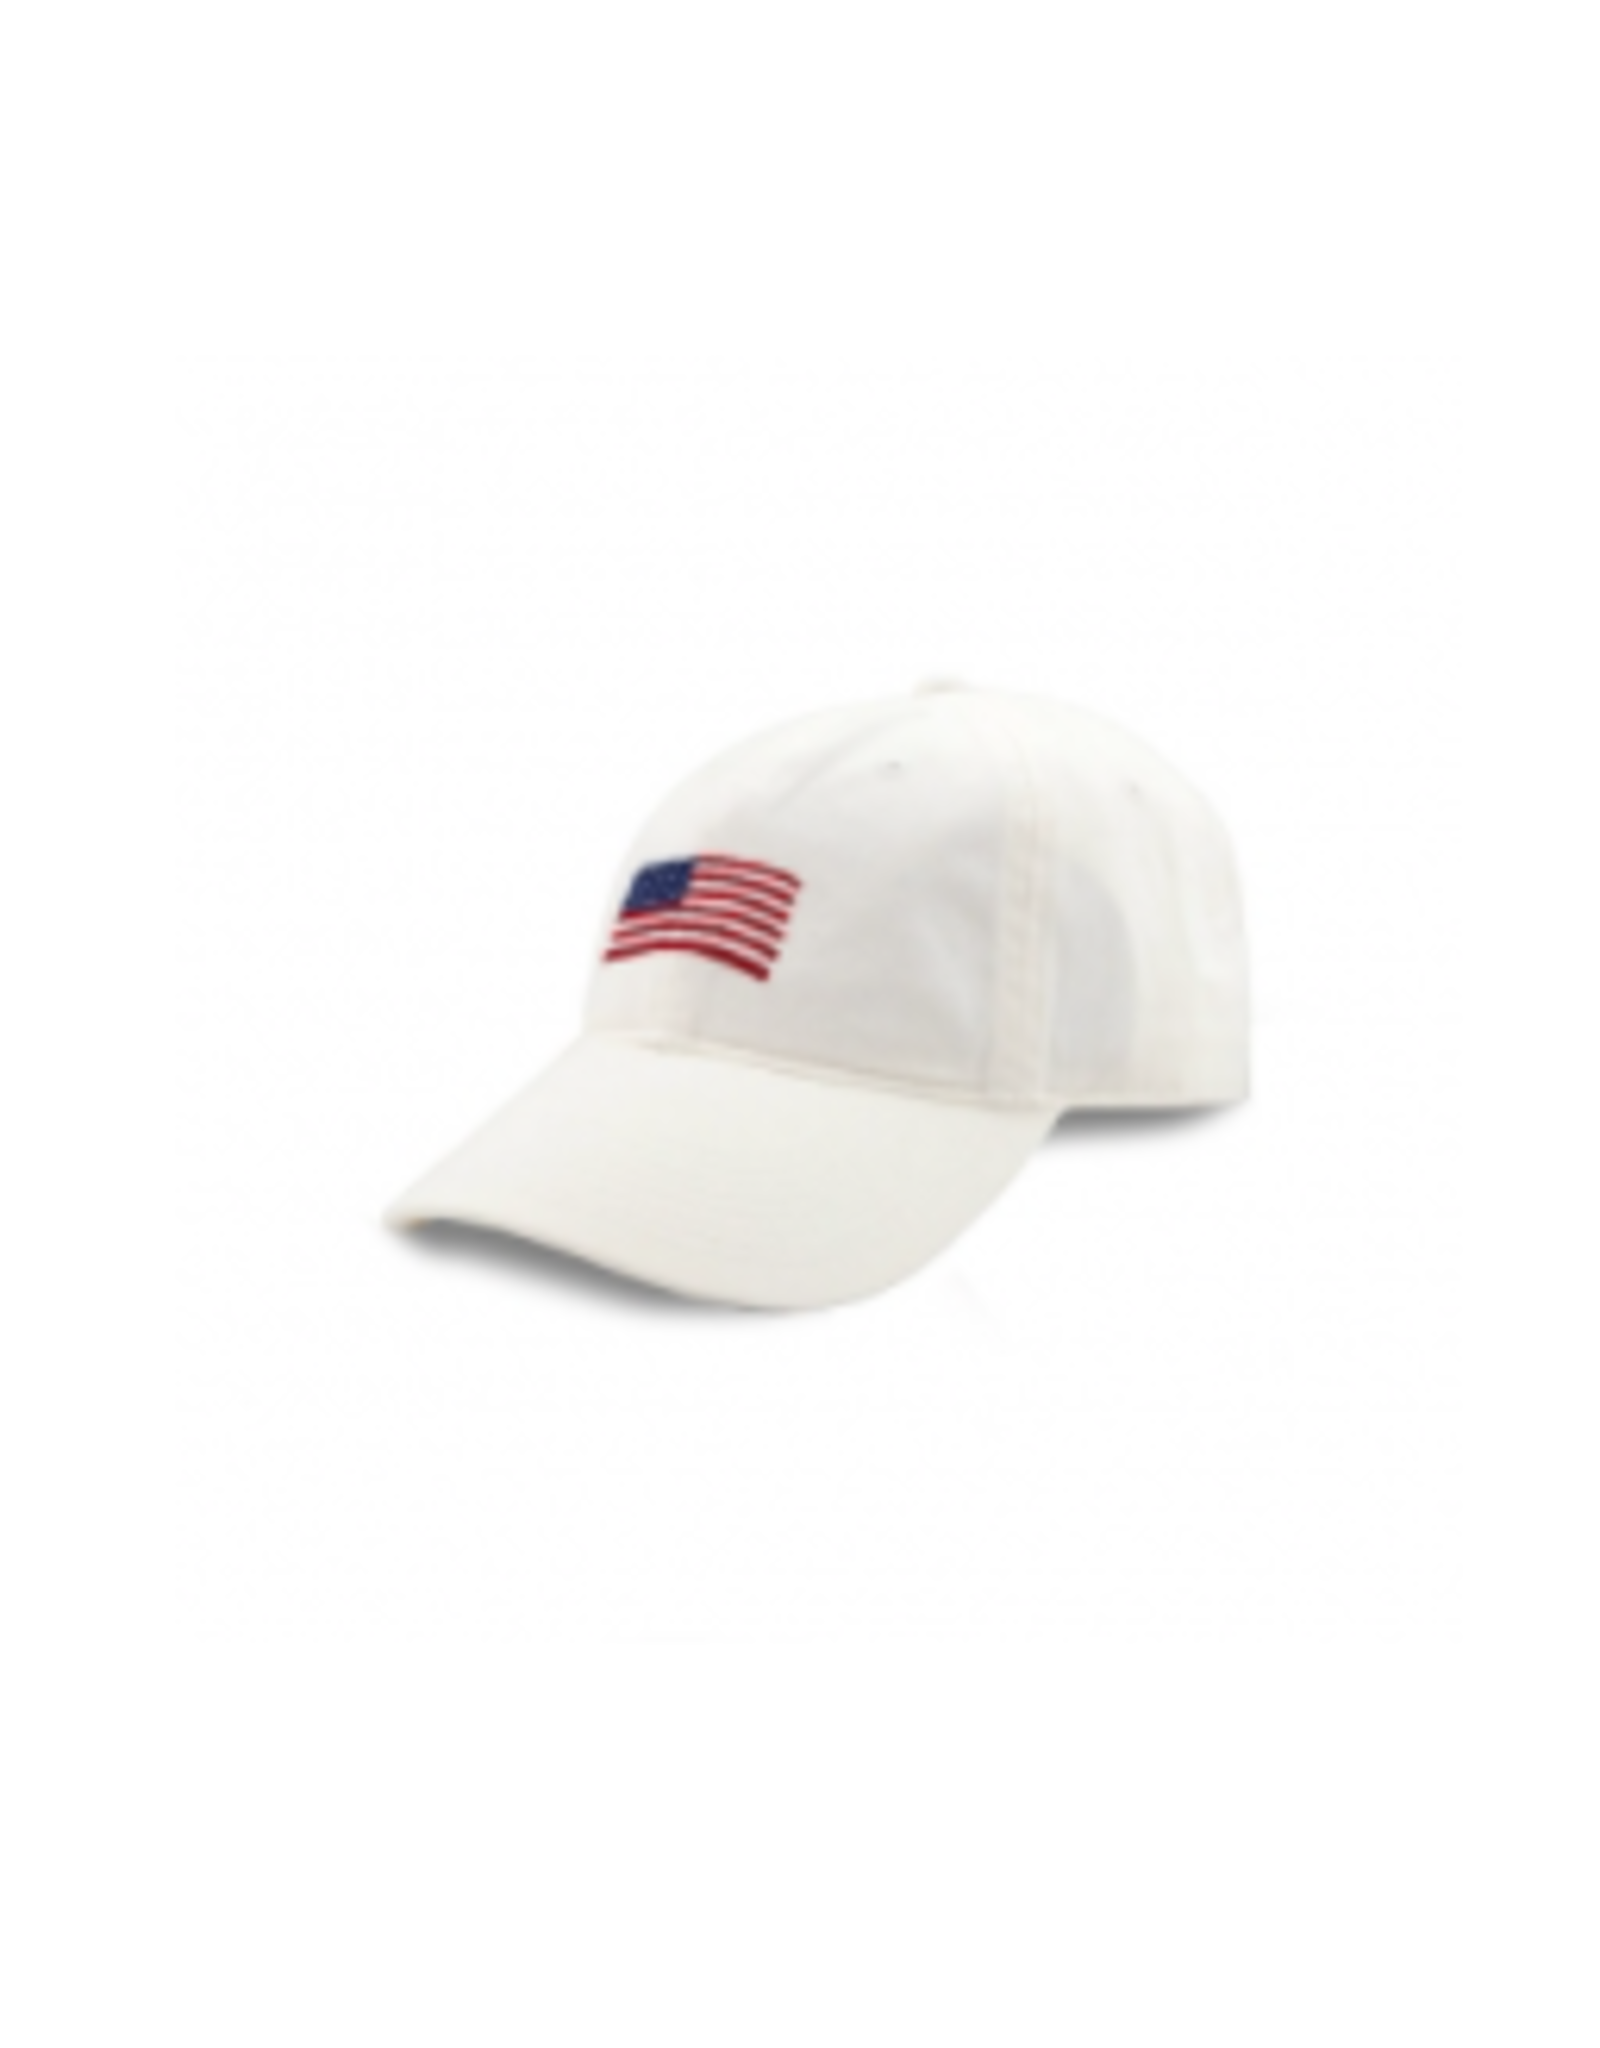 Smathers & Branson S&B Needlepoint Ball Hat, American Flag on White